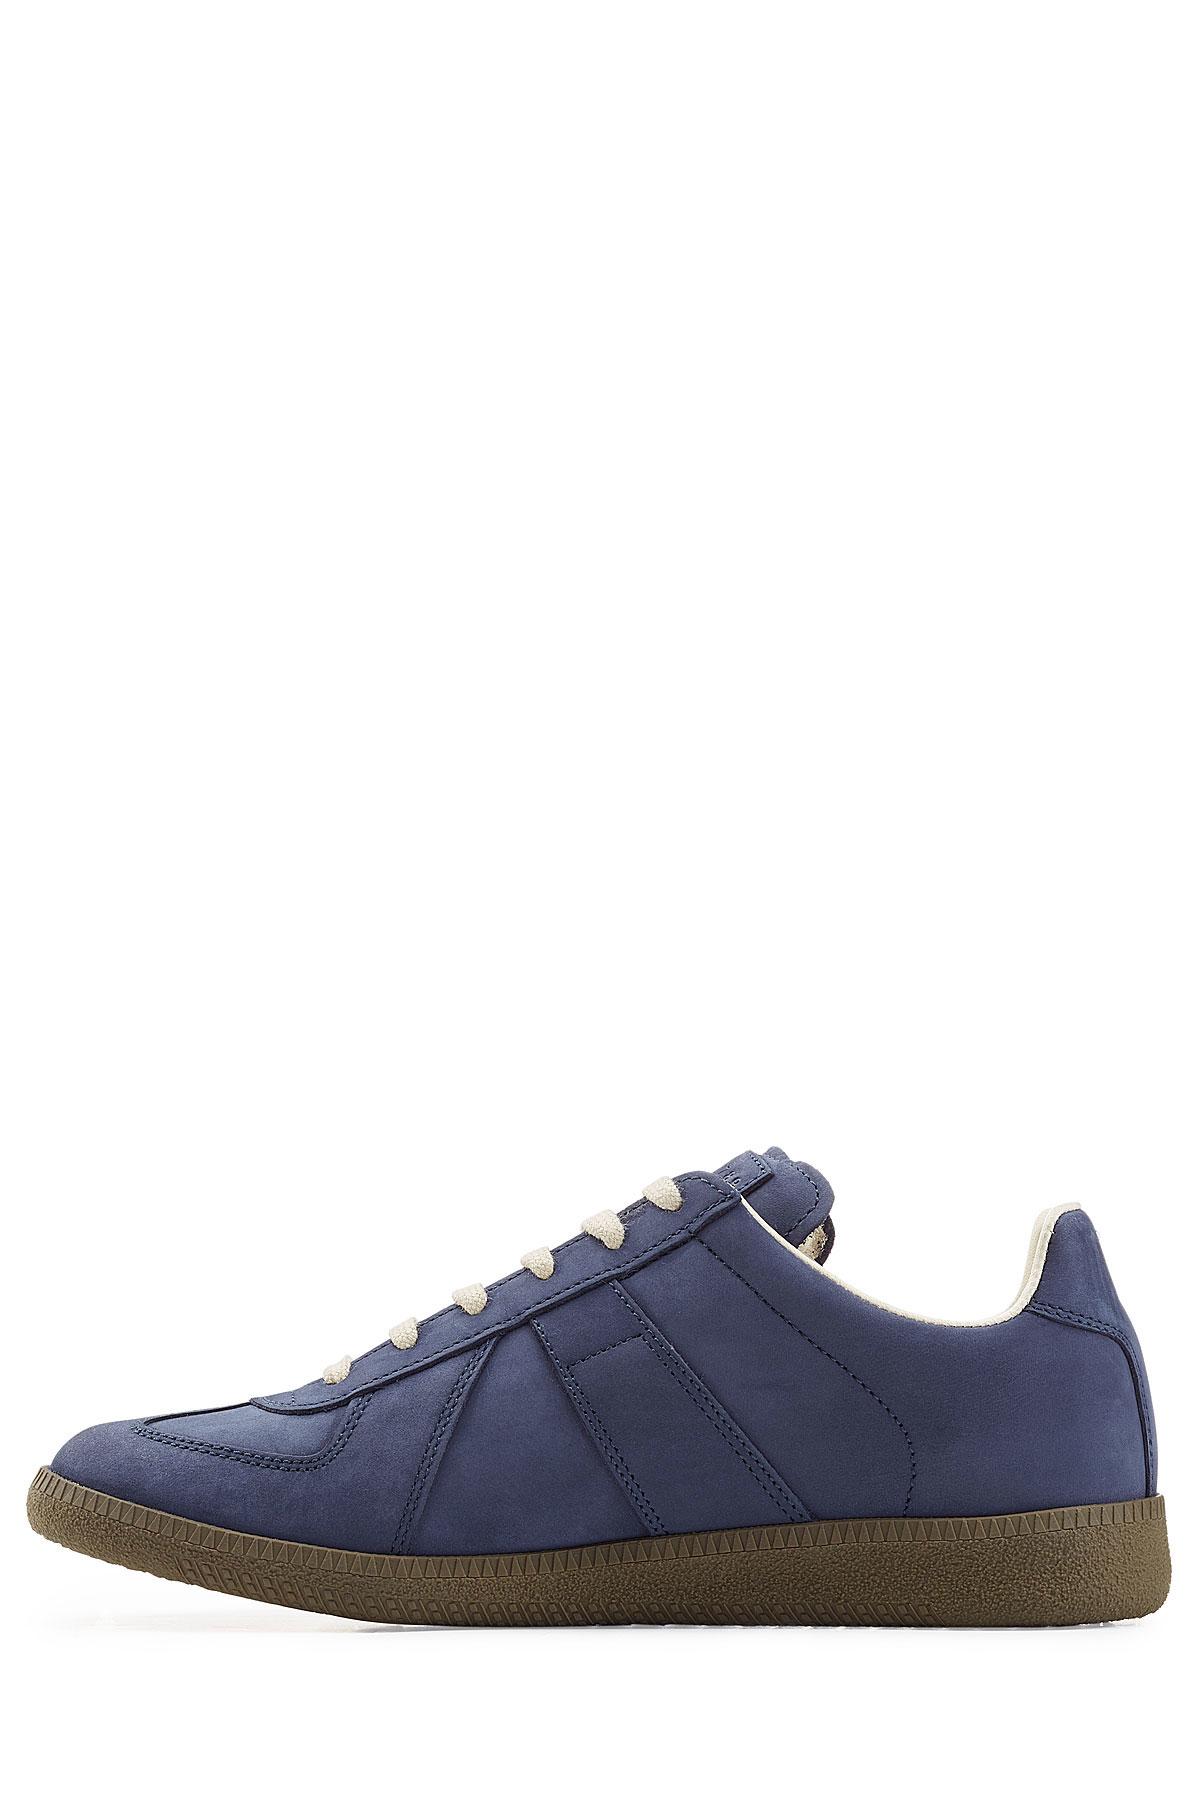 maison margiela suede sneakers blue in blue for men save 40 lyst. Black Bedroom Furniture Sets. Home Design Ideas